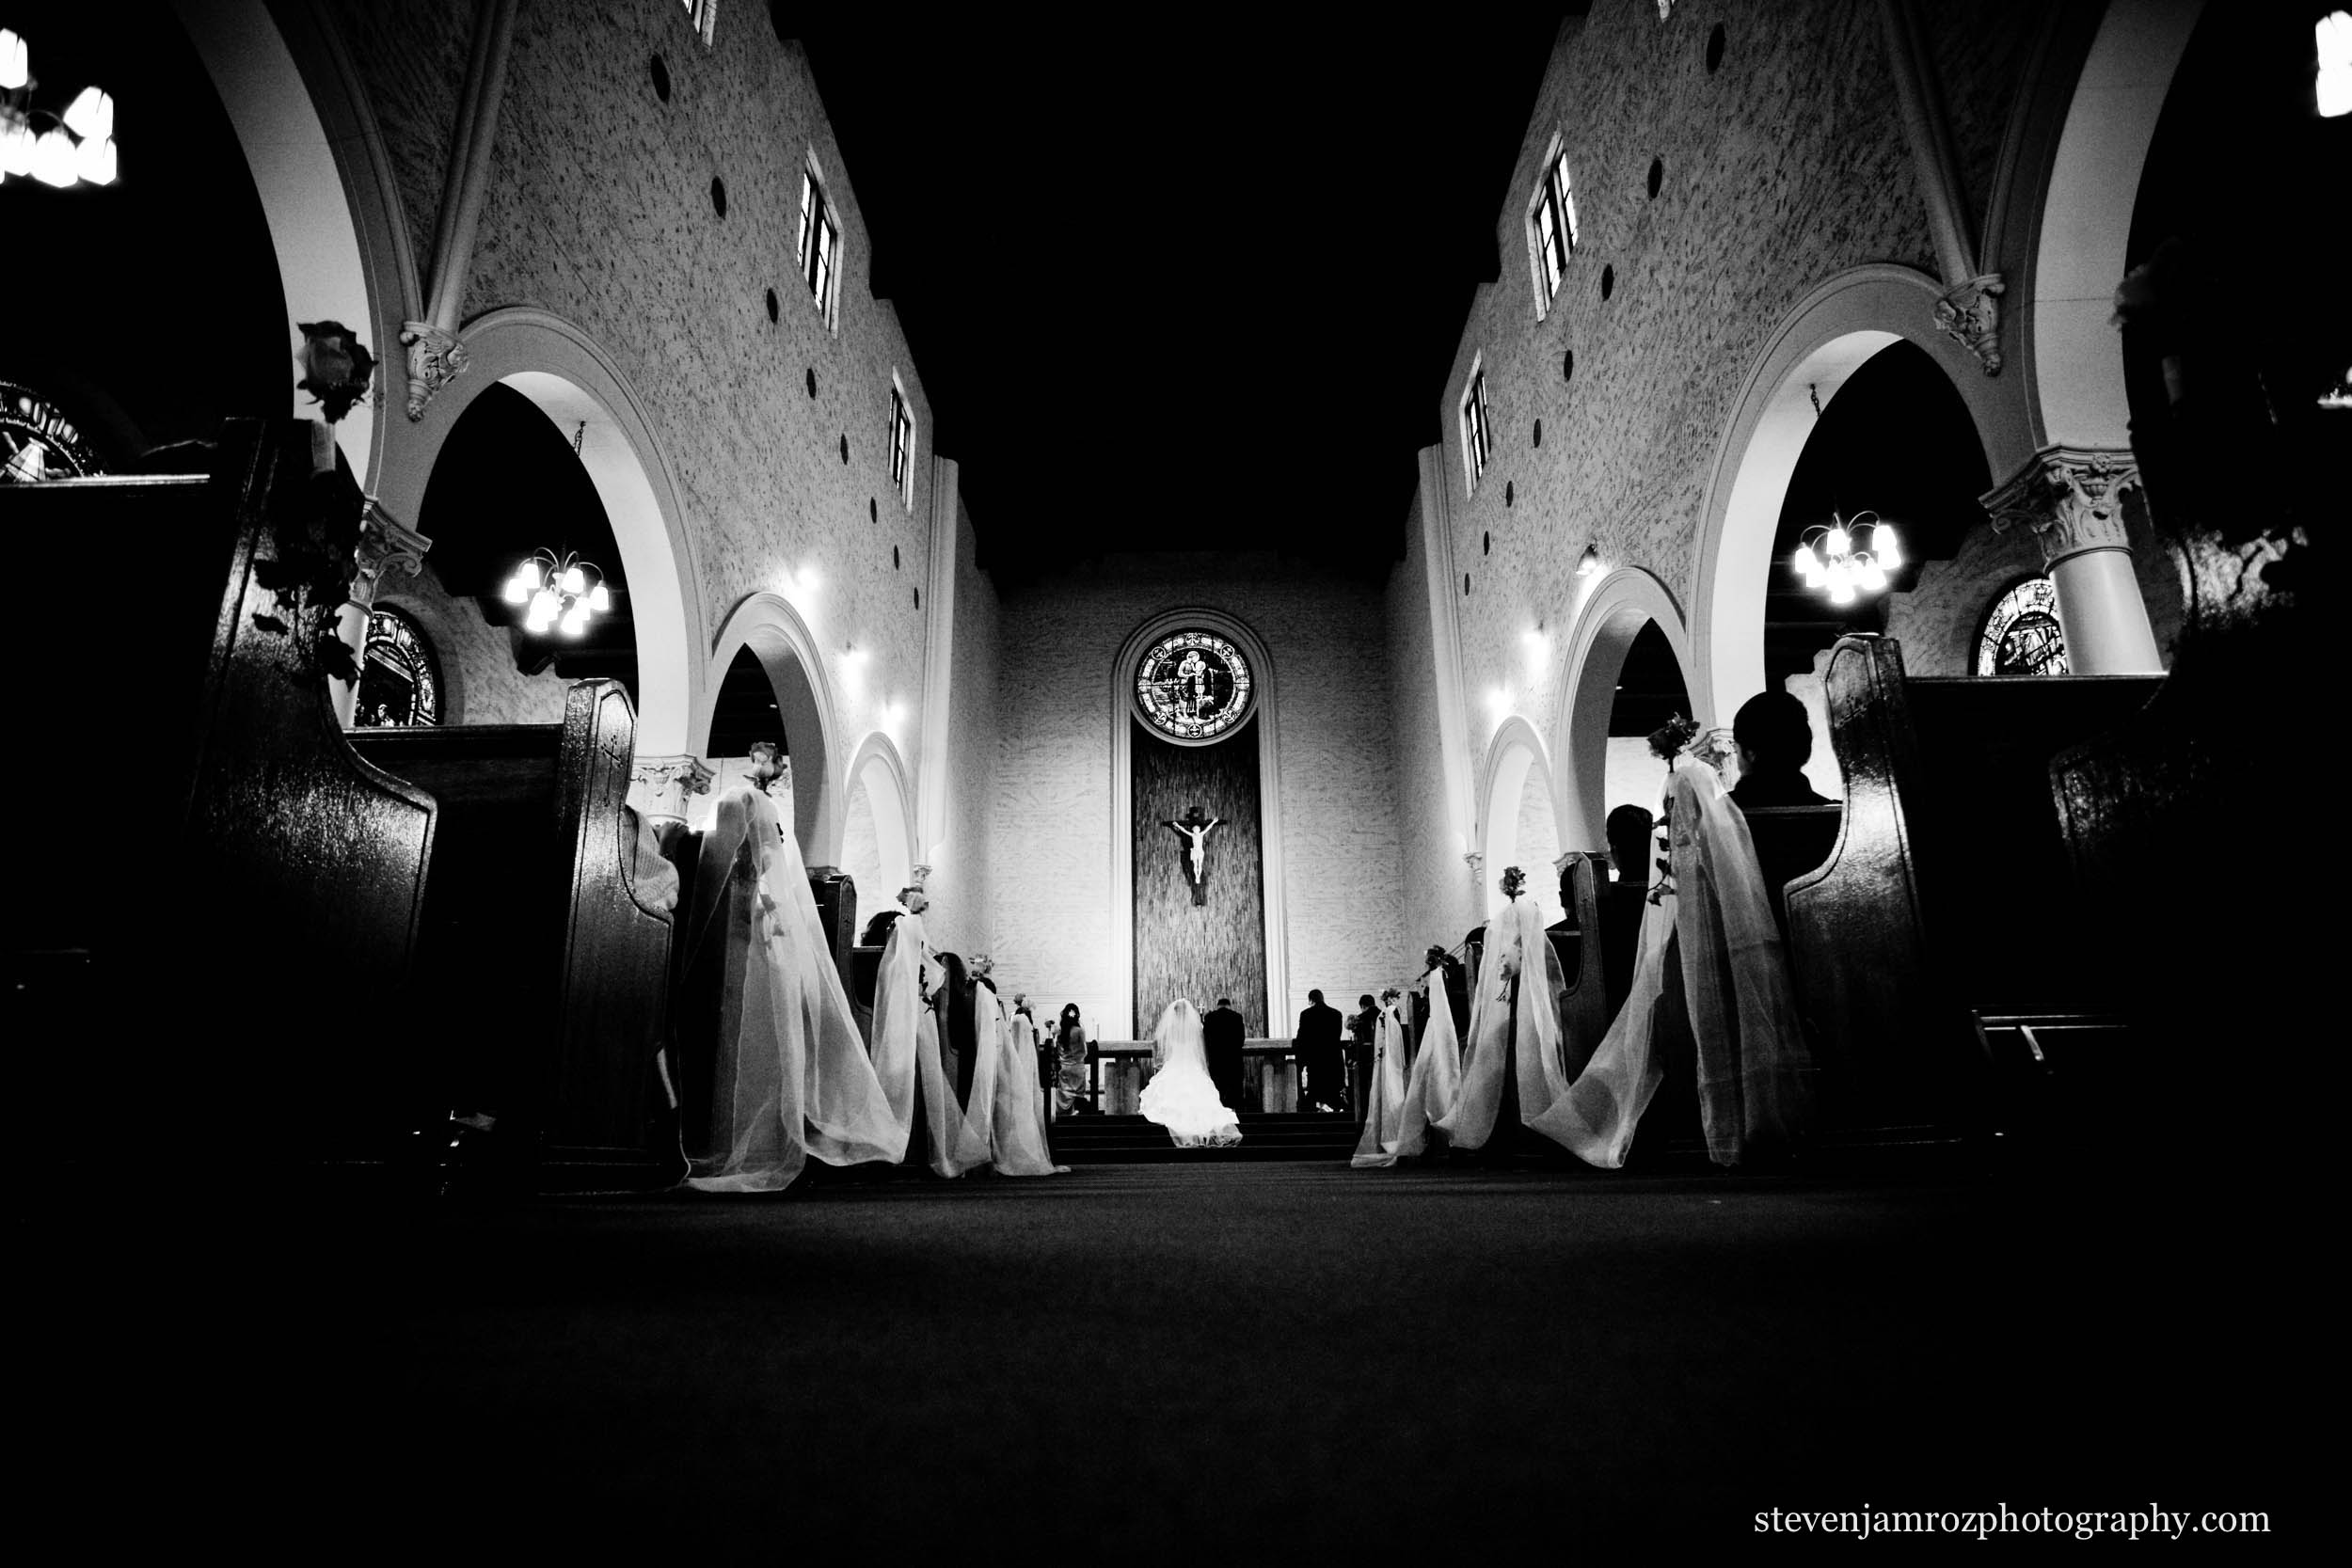 cary-church-wedding-venues-photography-0886.jpg